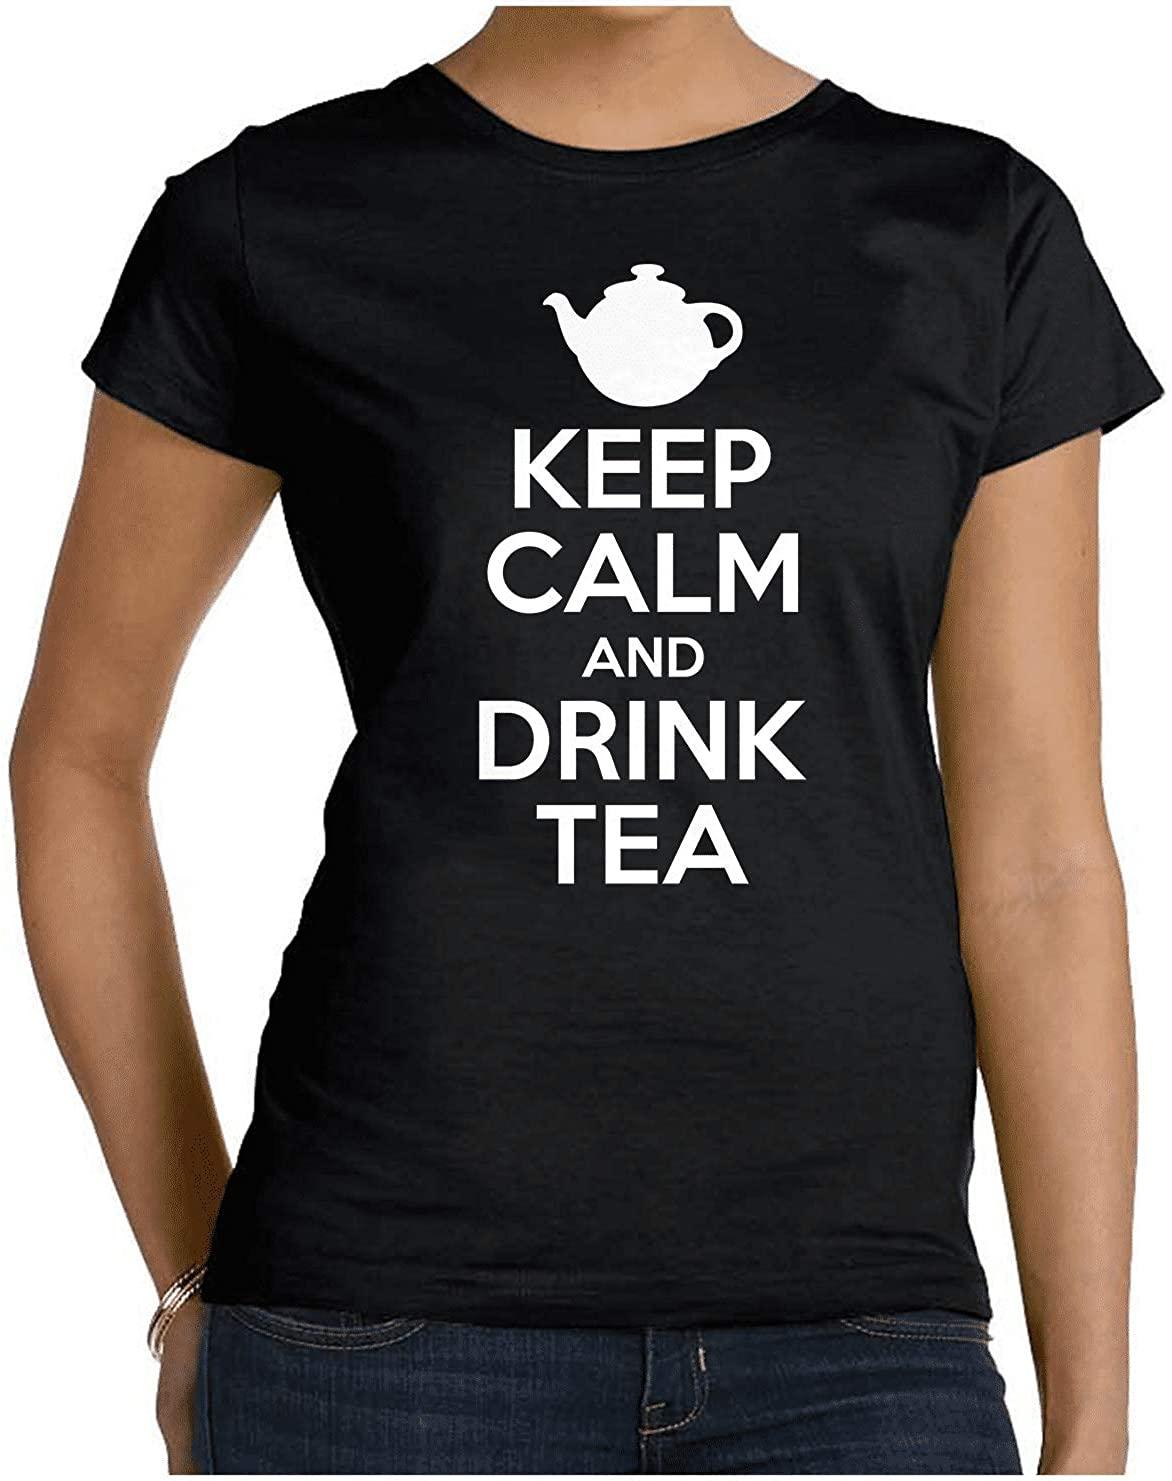 HARD EDGE DESIGN Women's Keep Calm and Drink Tea Crew Neck T-Shirt, X-Large, Black